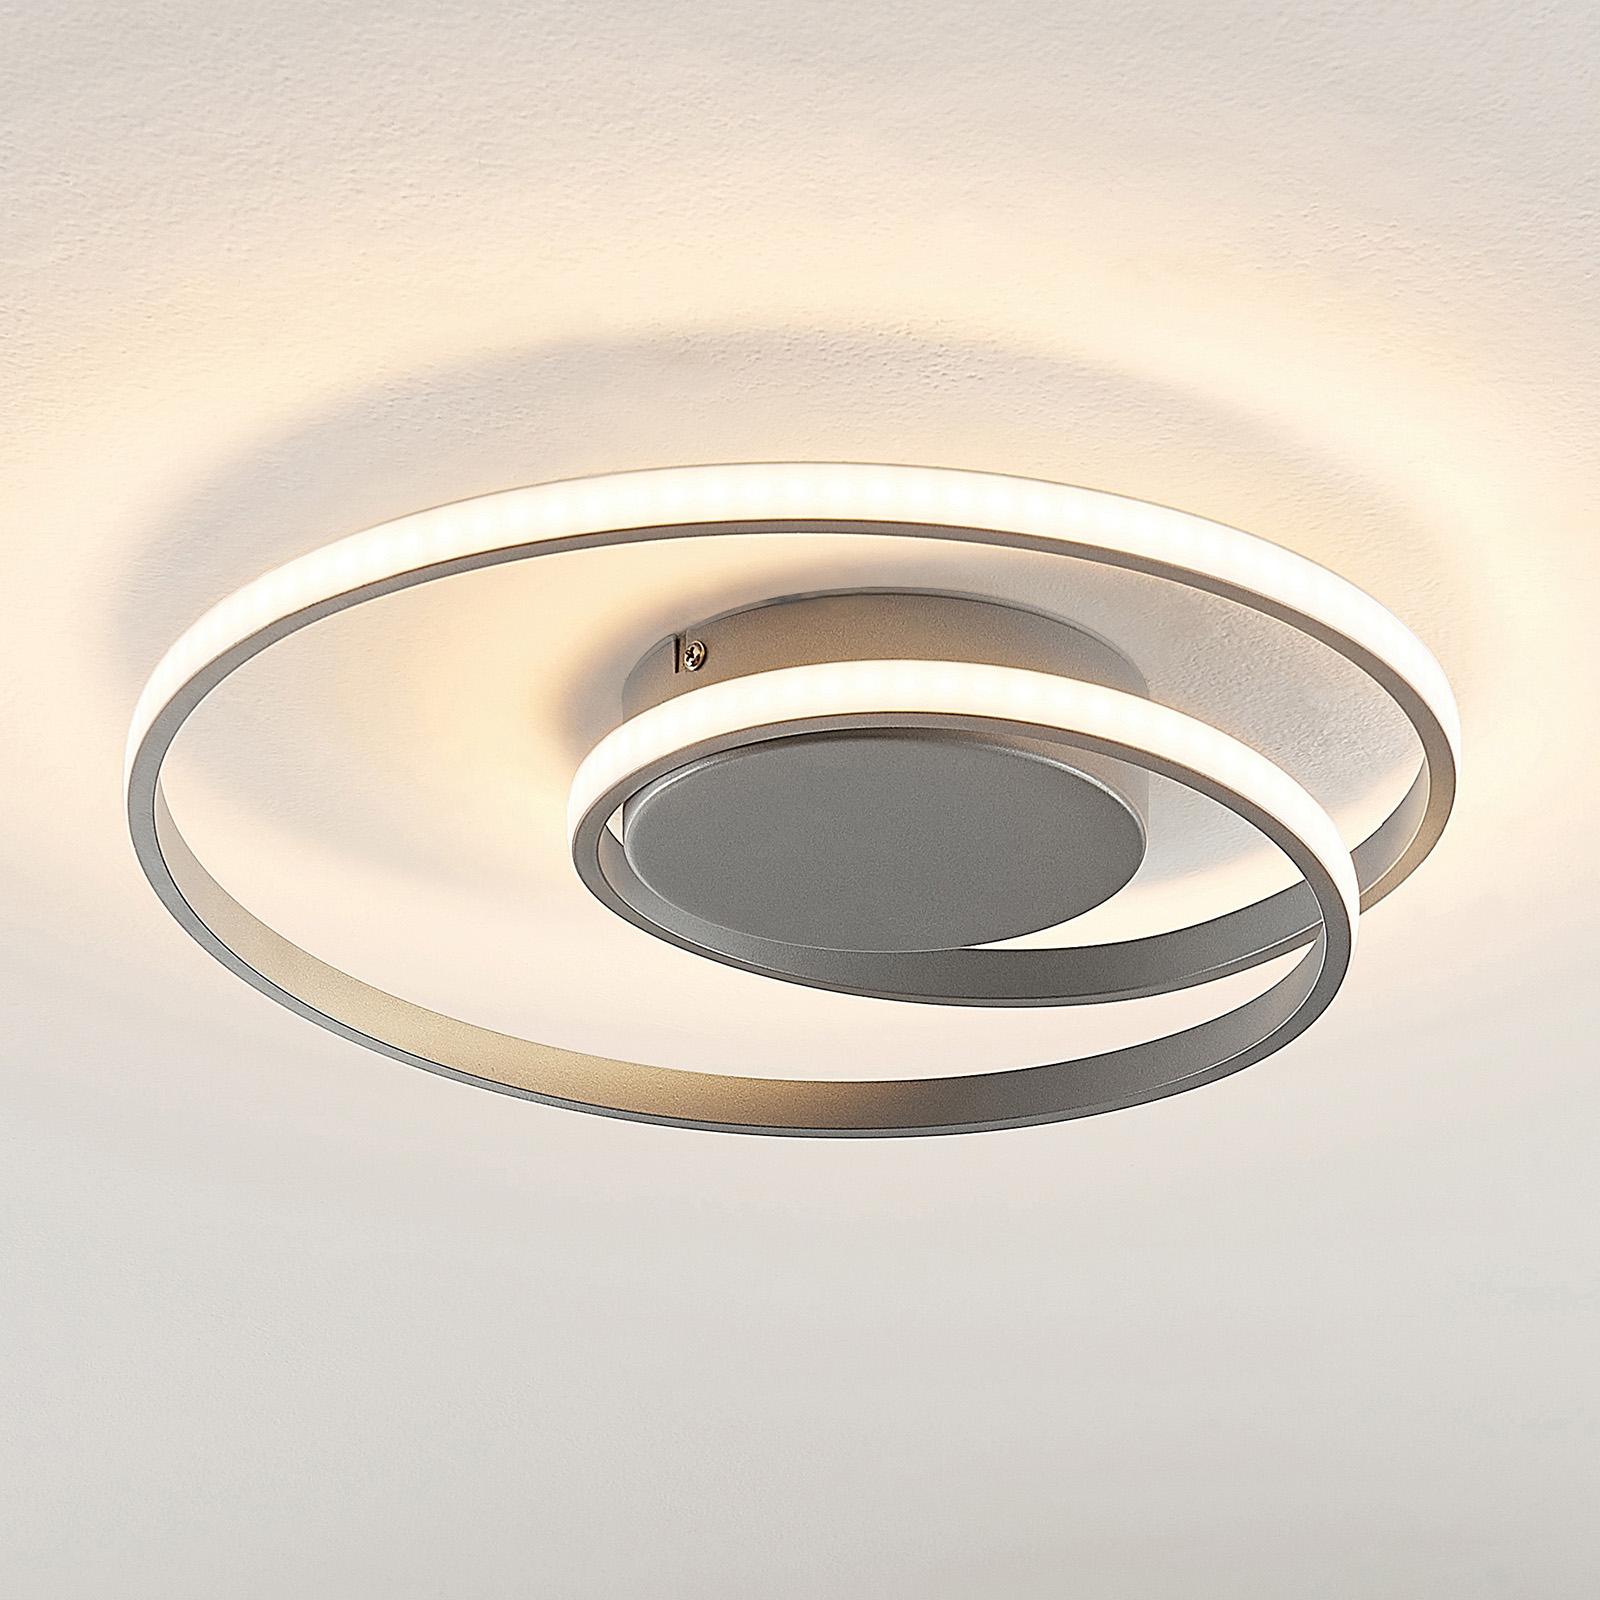 Lindby Kyron lampa sufitowa LED, srebrna tytanowa